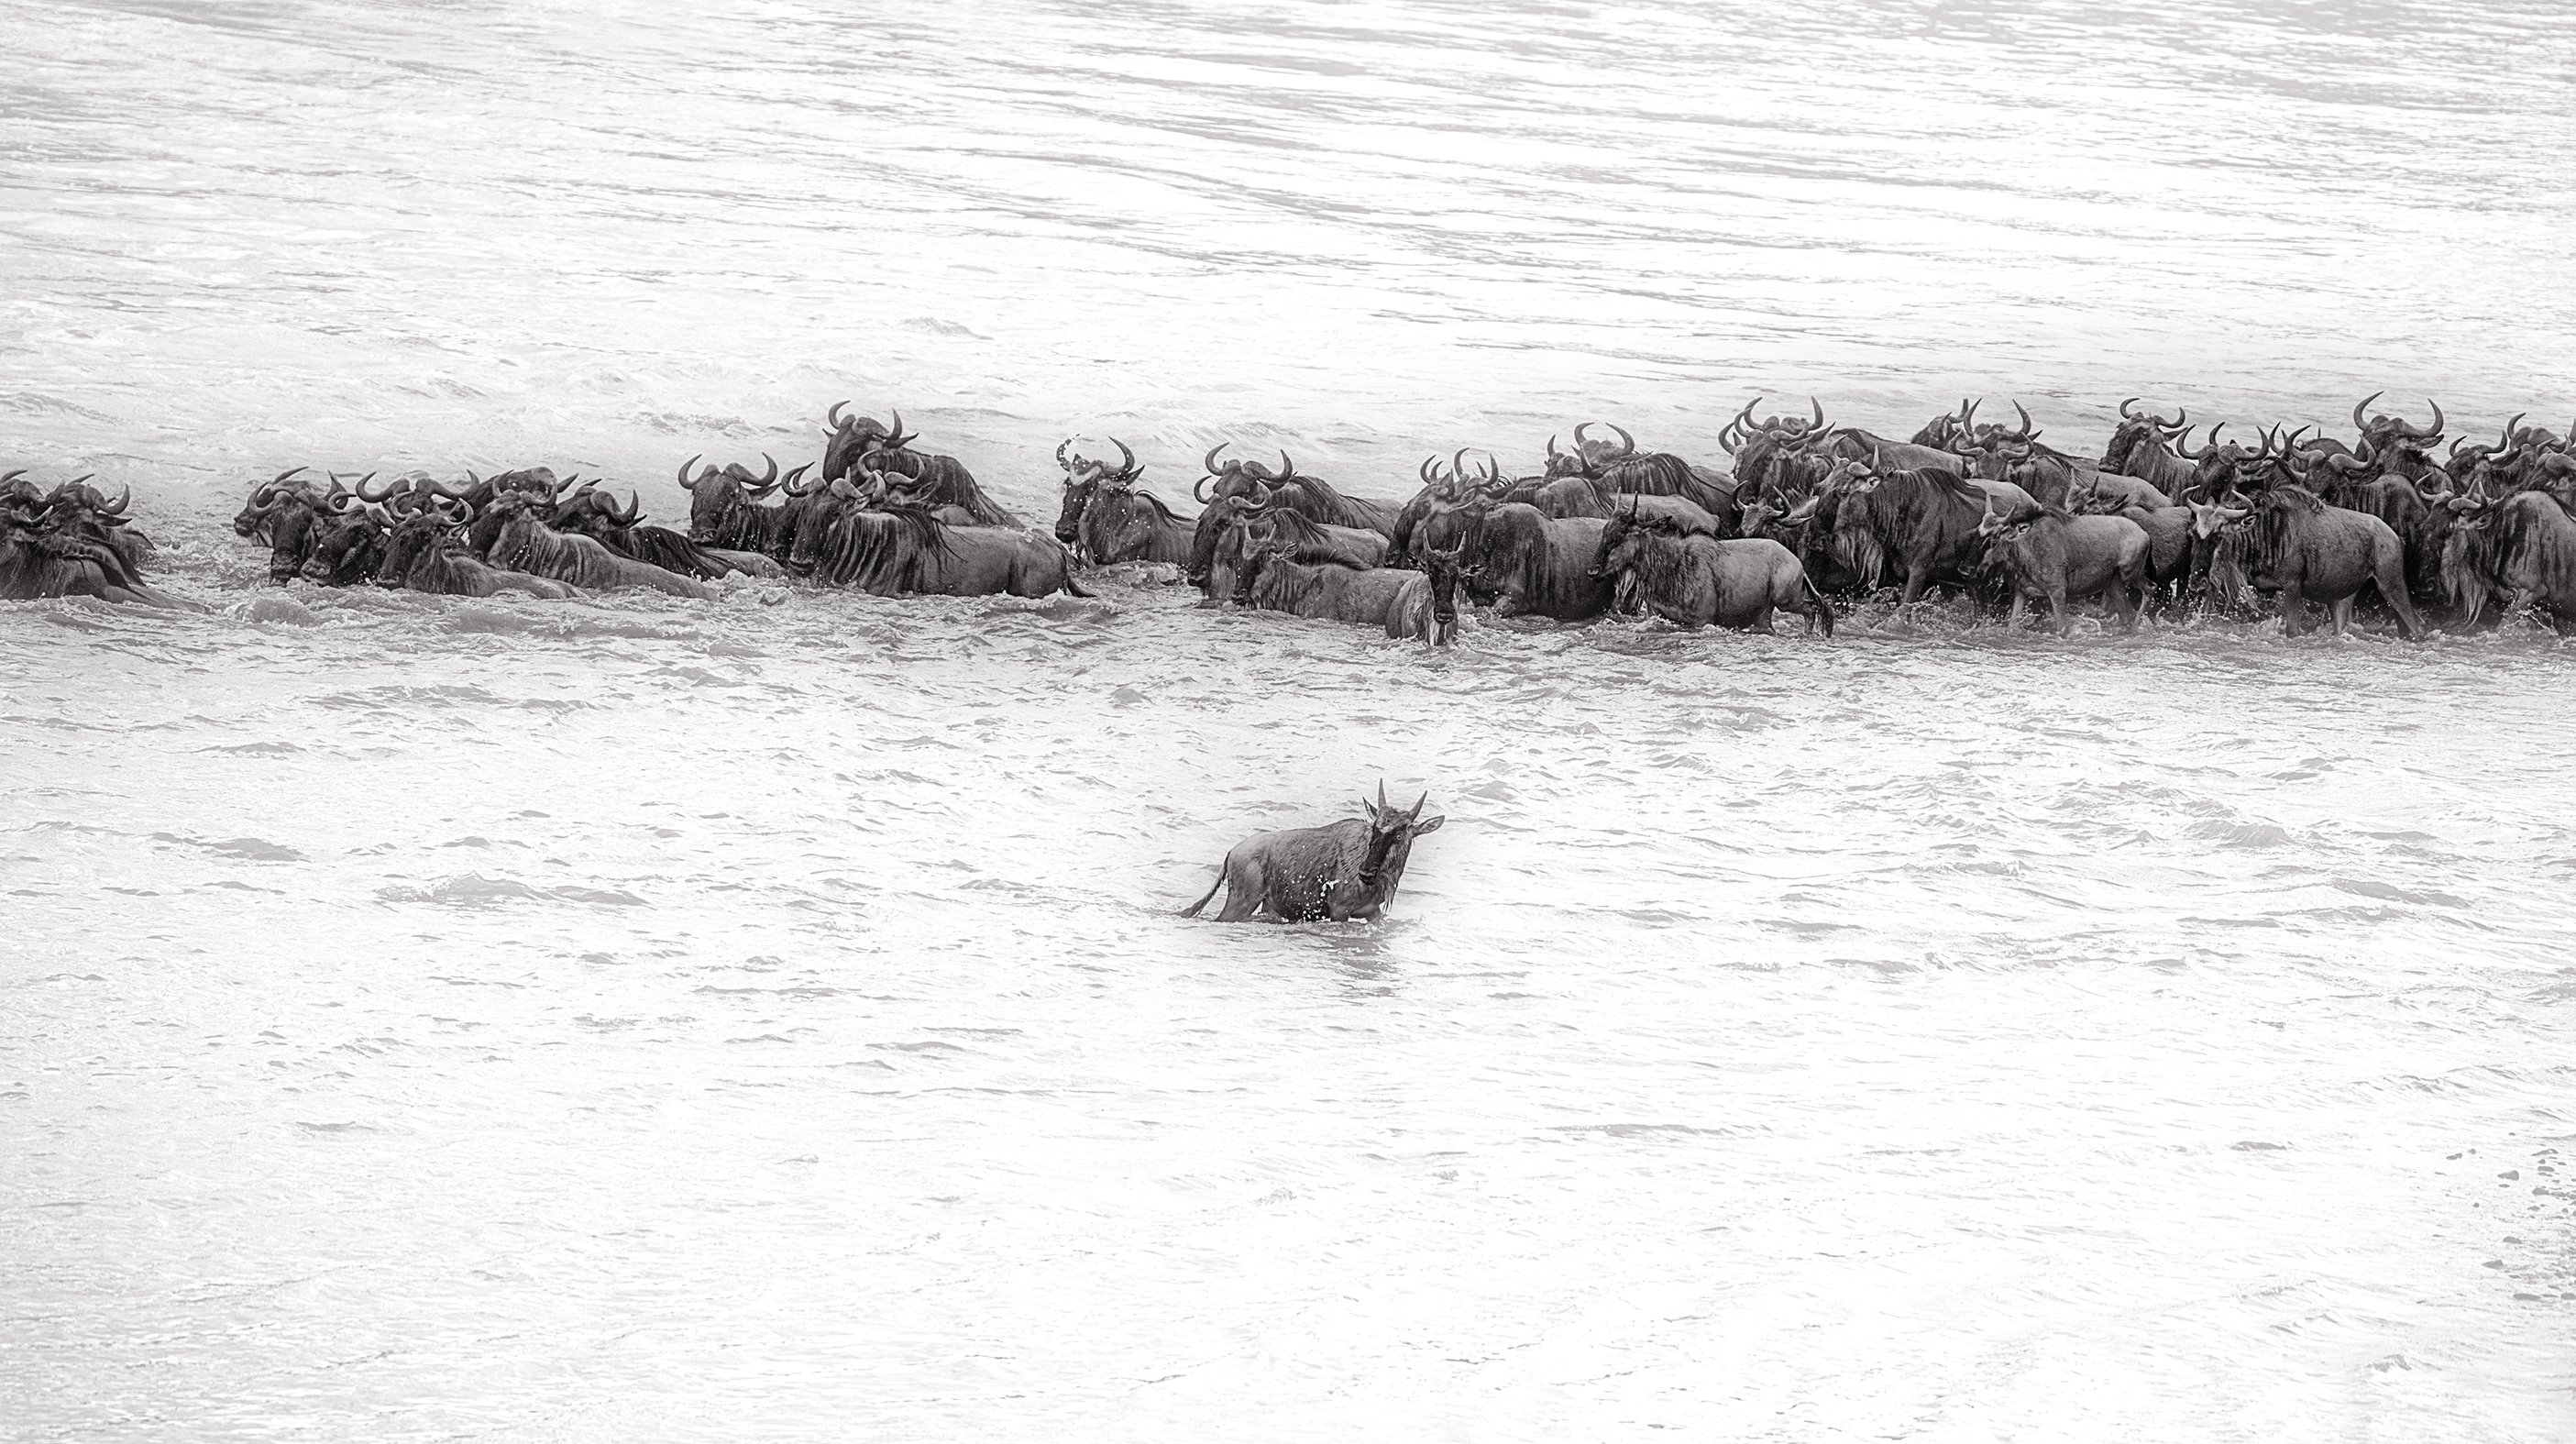 Wildebeest goes opposite side of the rest of the herd in Mara Rivers crossing